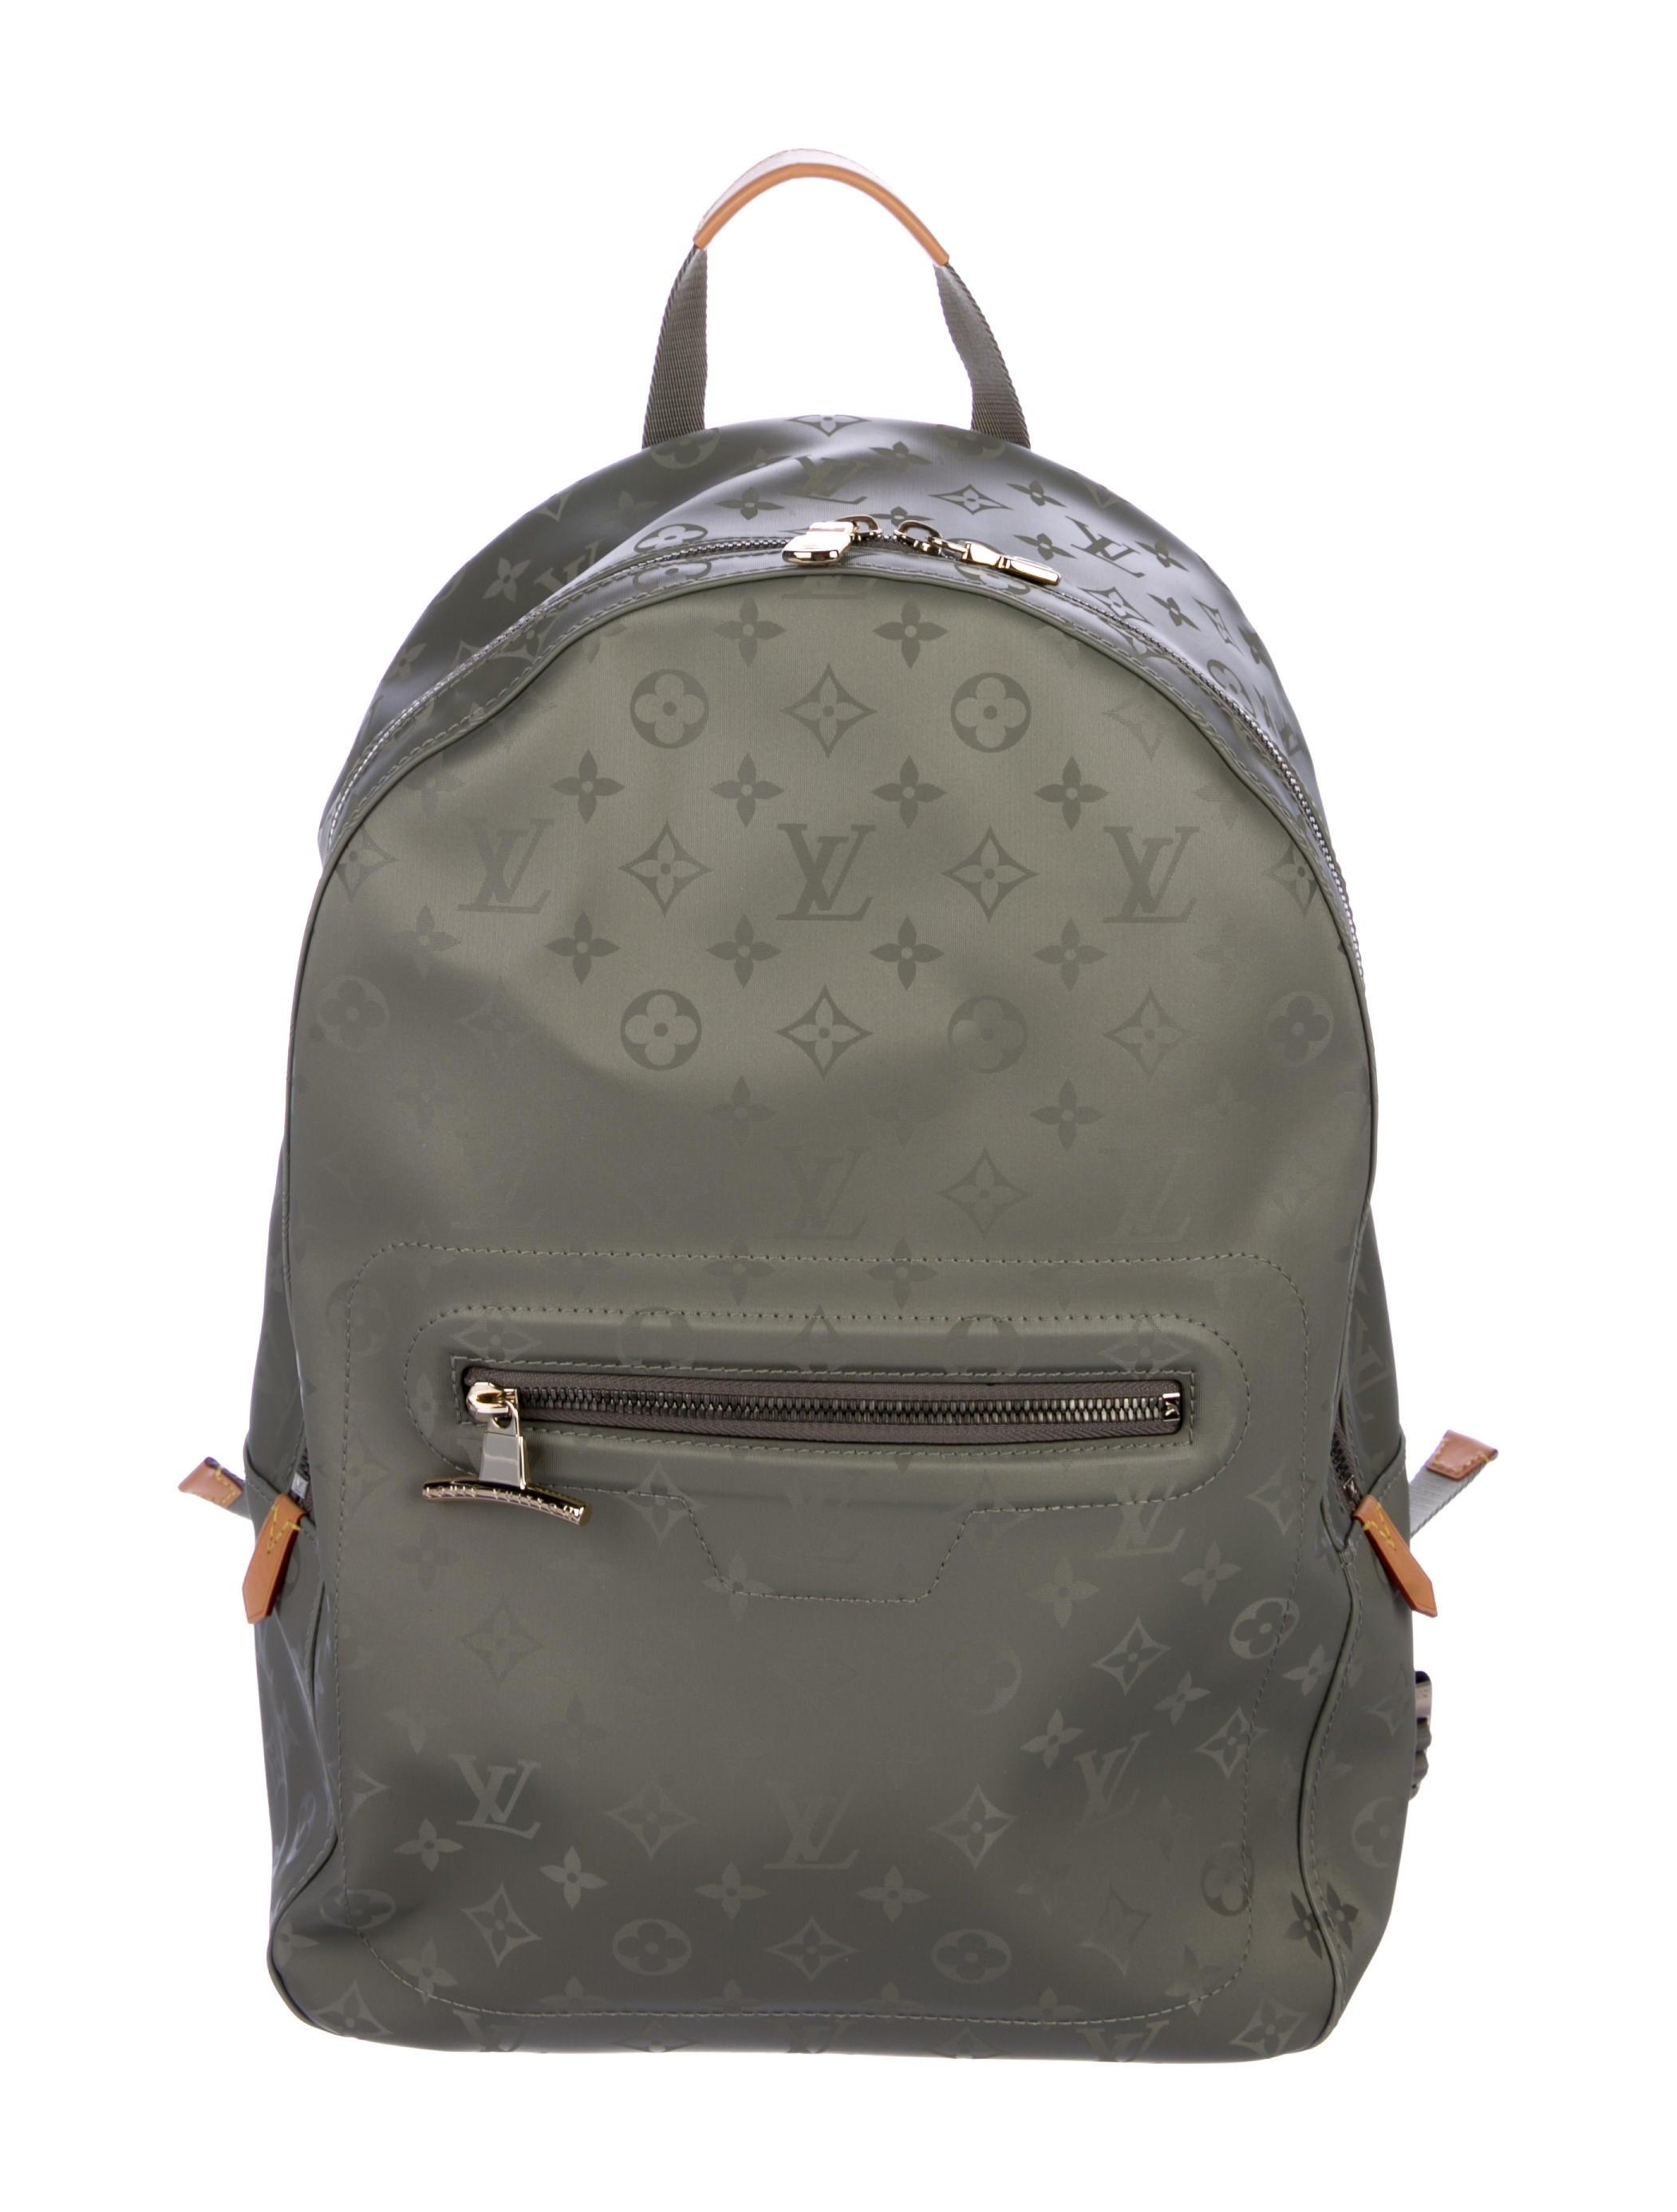 e2d02a3b5fe Louis Vuitton Monogram Titanium Backpack PM - Bags - LOU198057